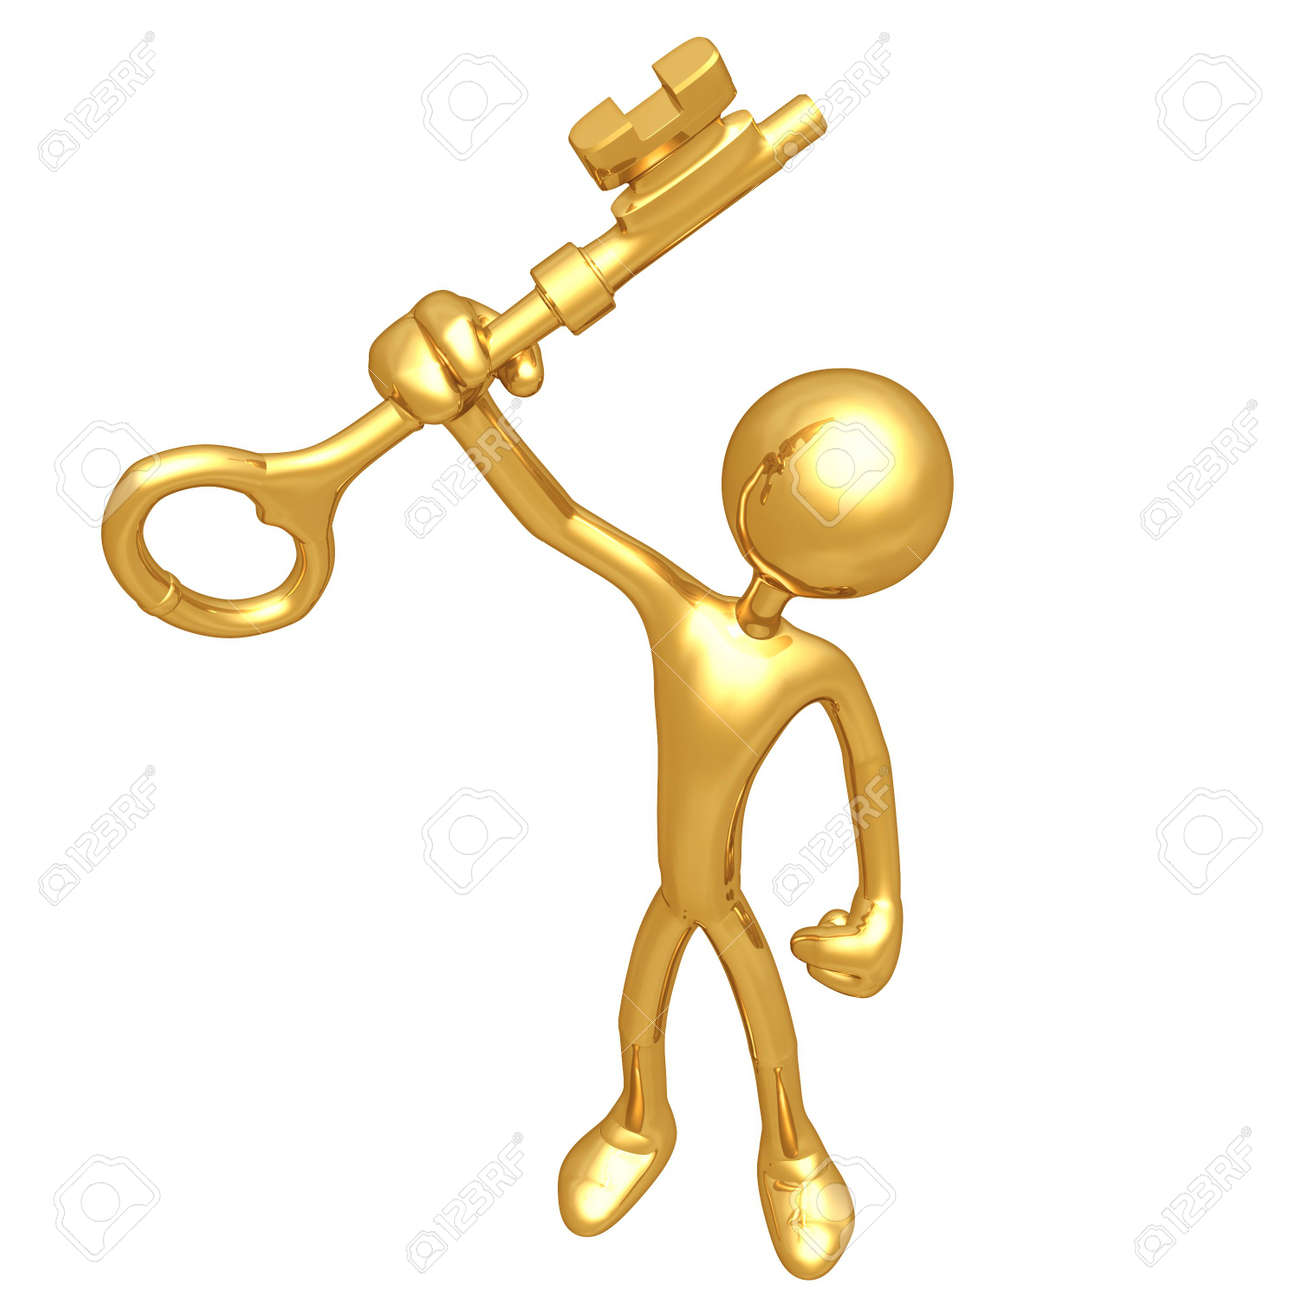 Holding The Golden Key Stock Photo - 4759212